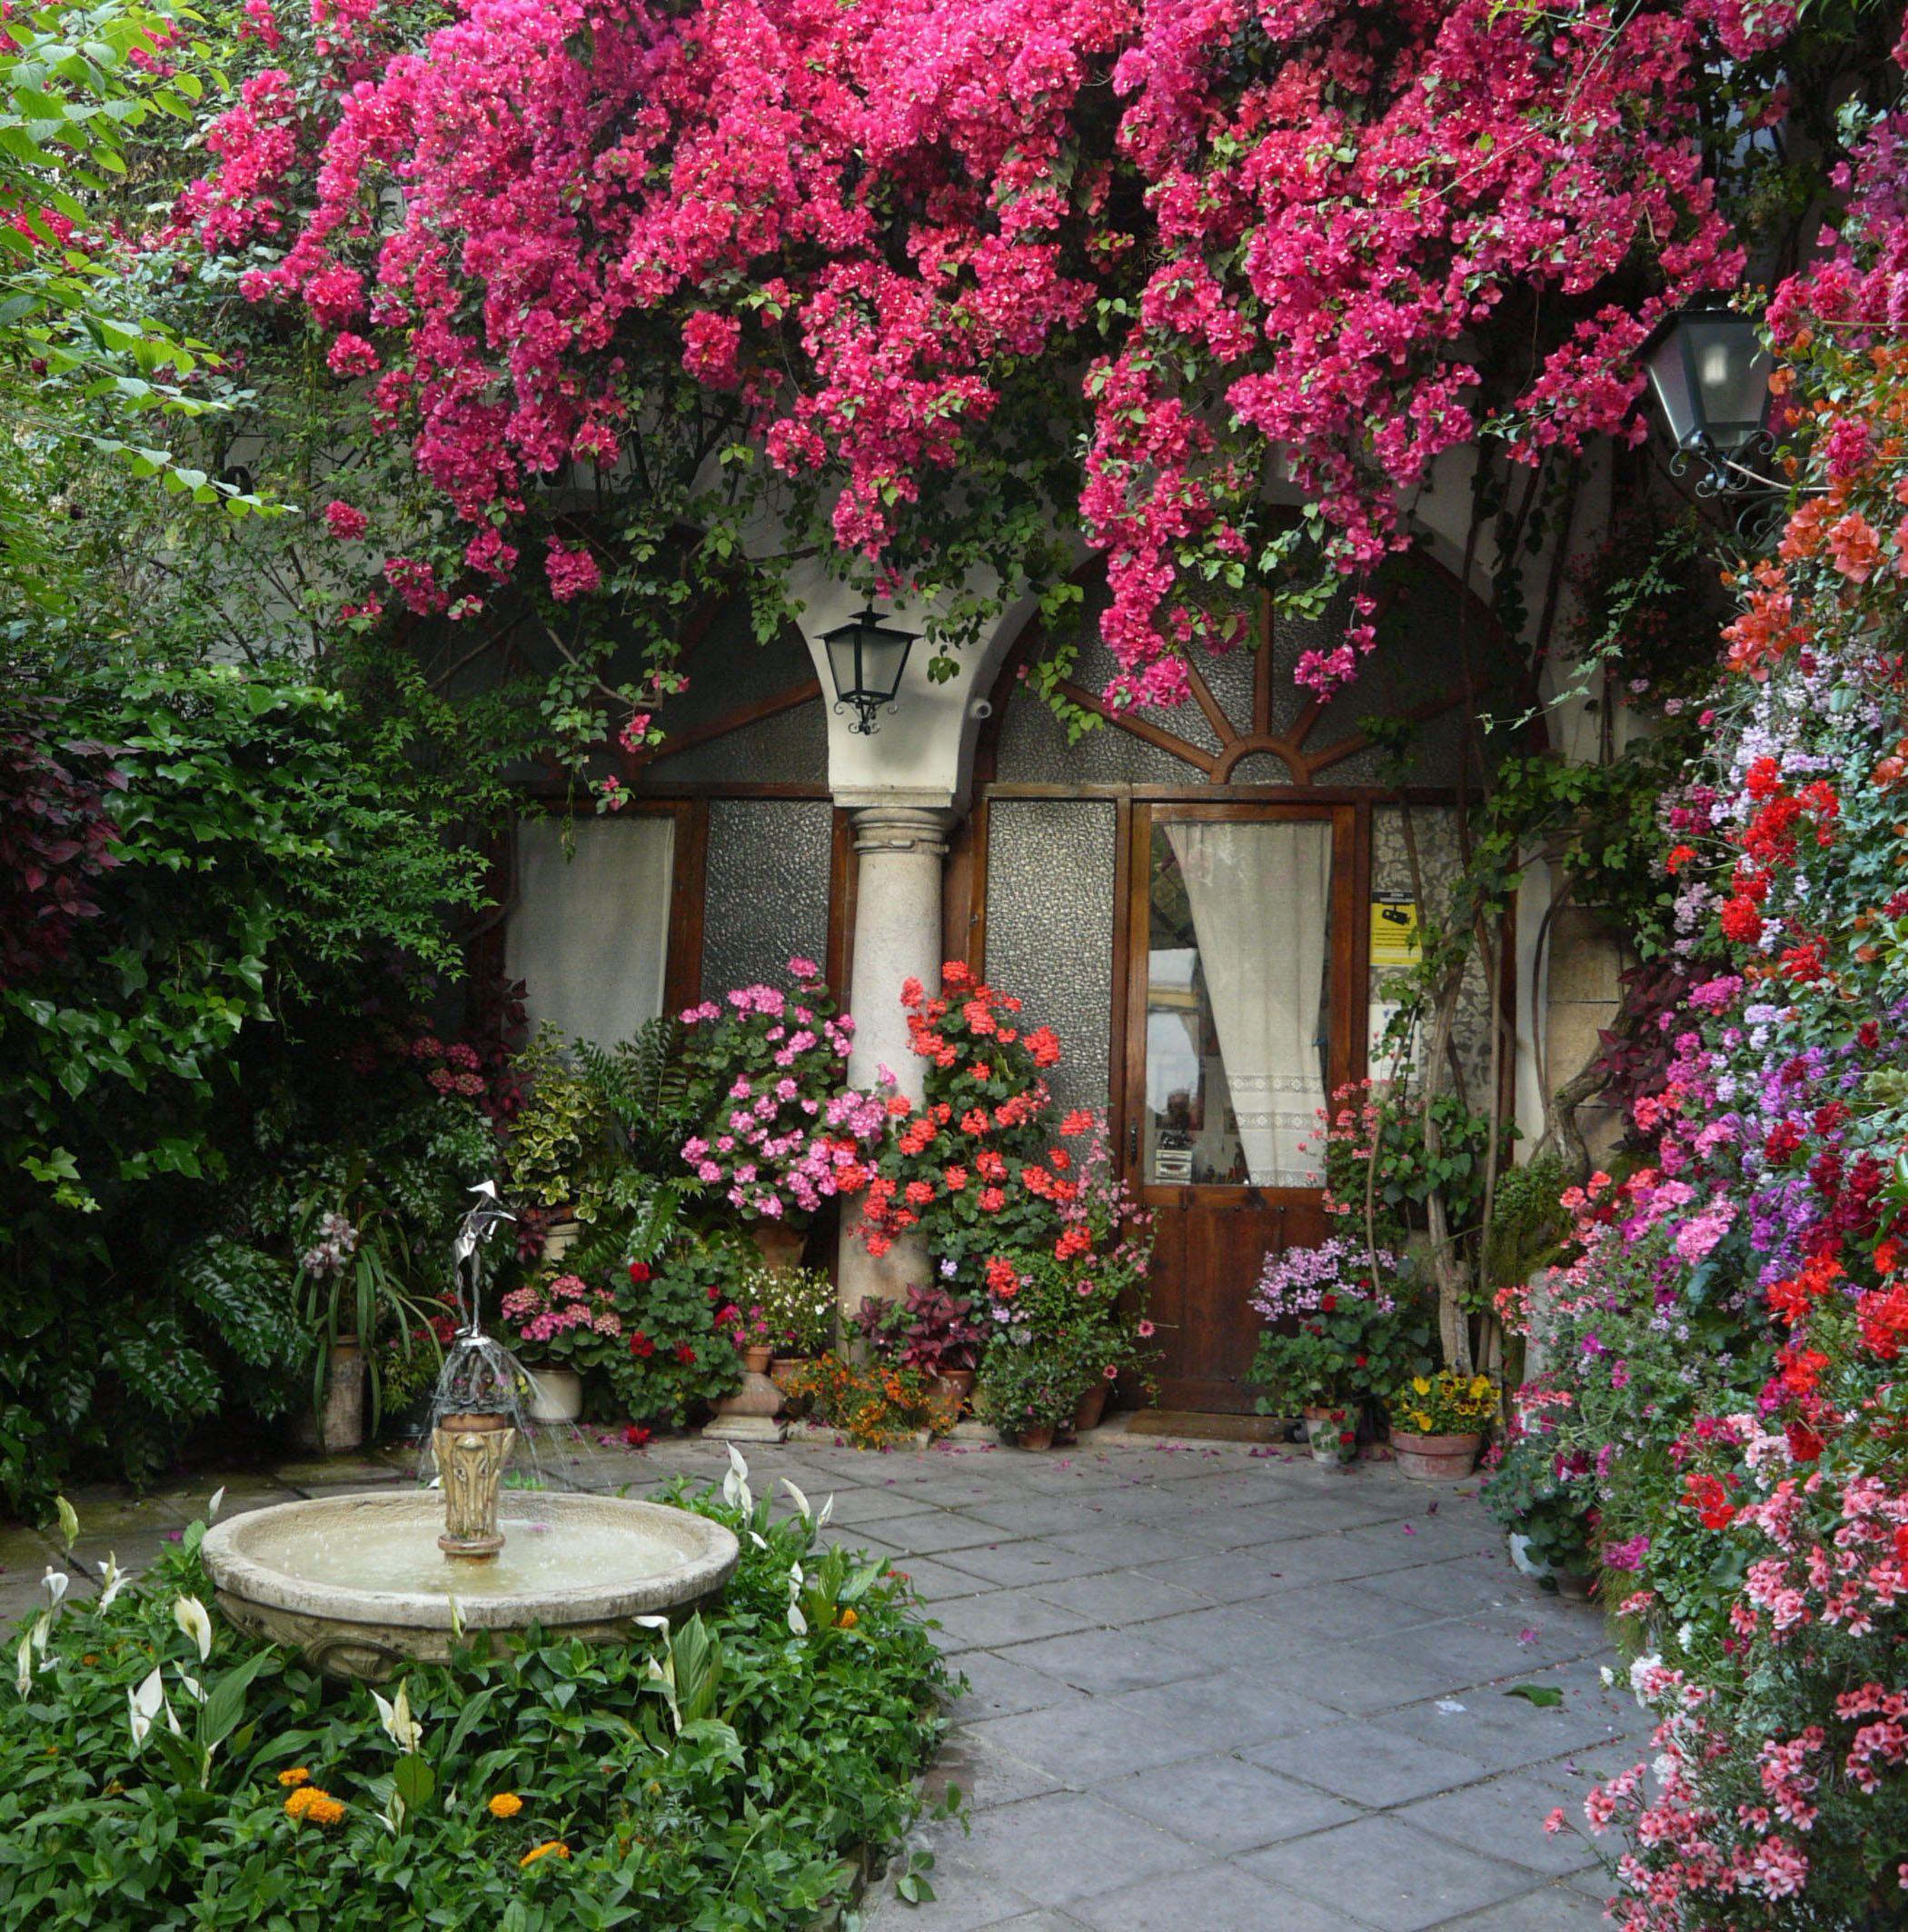 Patio calle la palma cordoba espa a jardines for Jardines cordoba